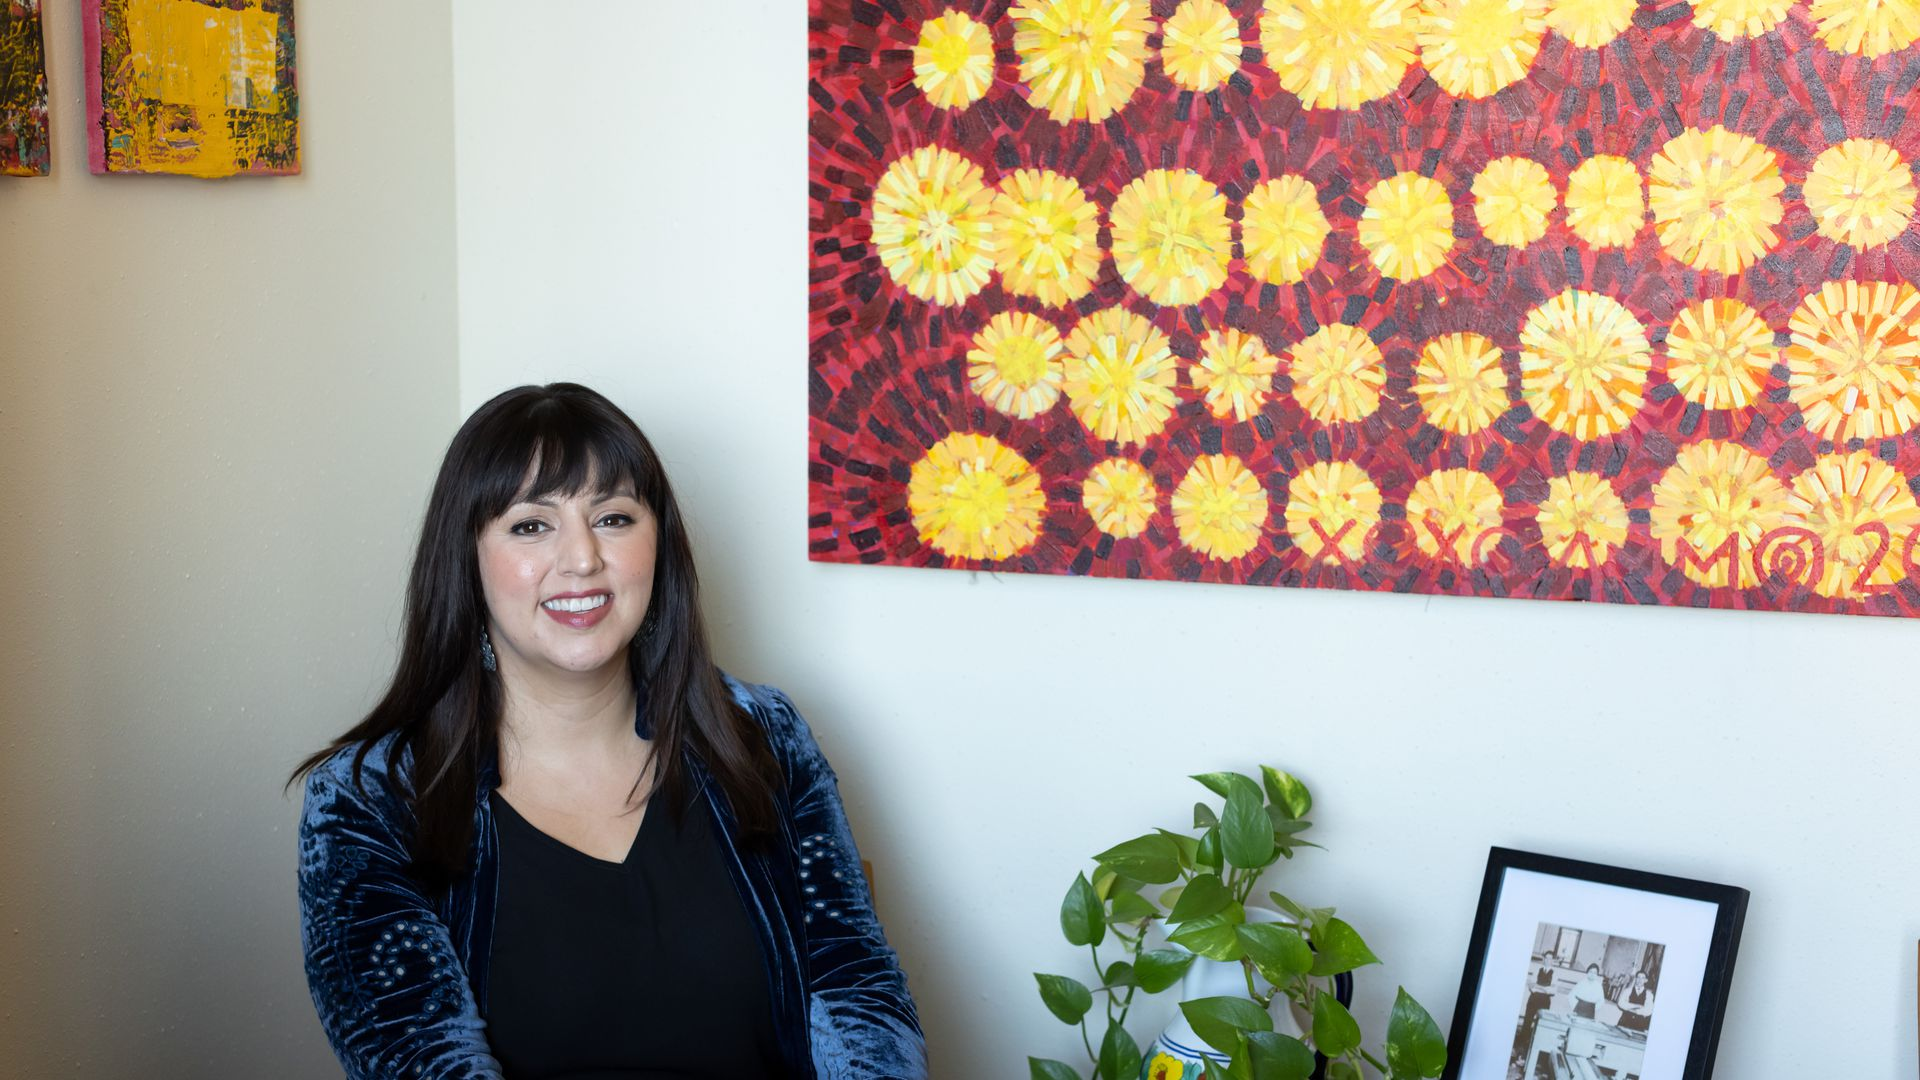 University of Texas history professor Monica Muñoz Martinez has won a 2021 MacArthur Foundation 'Genius' Grant